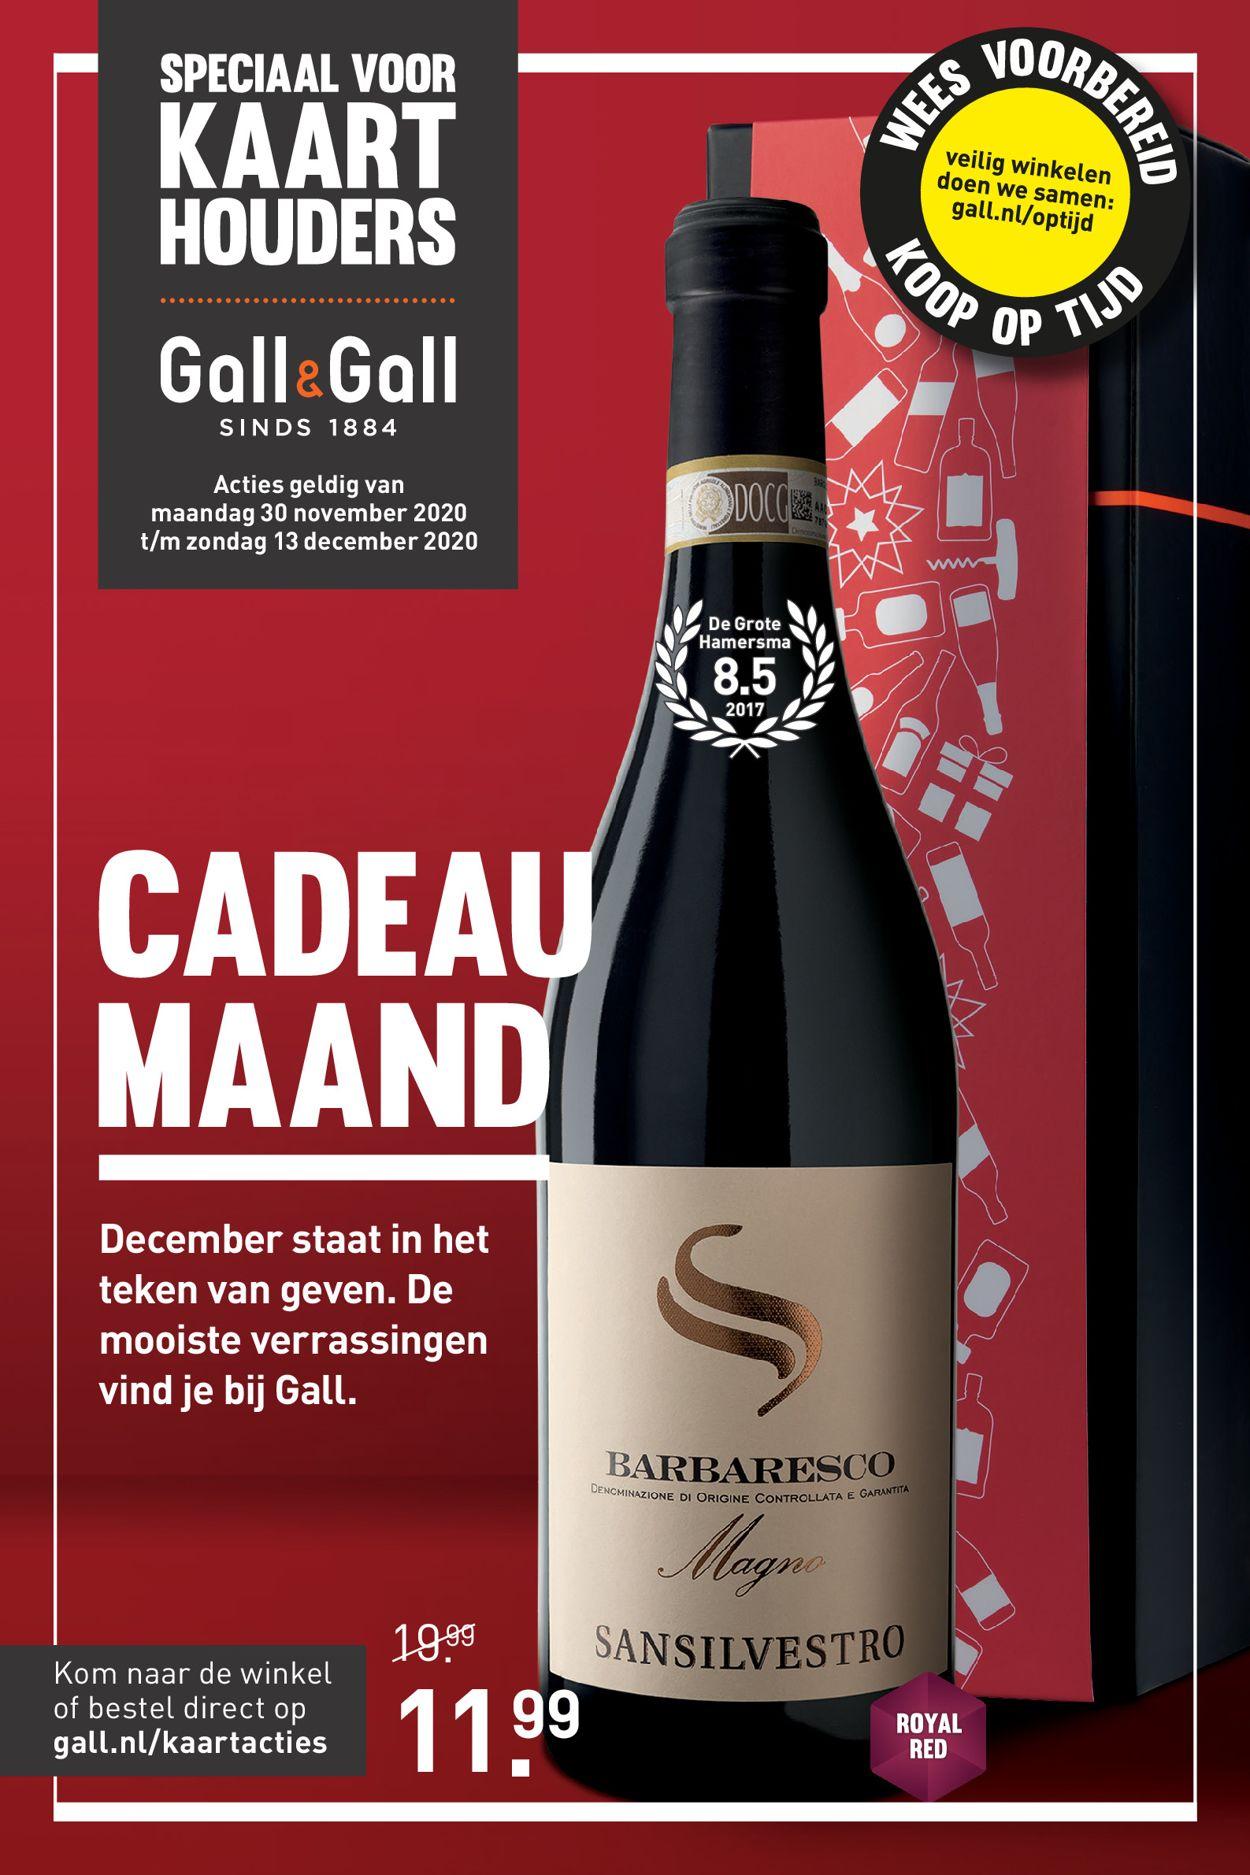 Catalogus van Gall & Gall van 30.11.2020